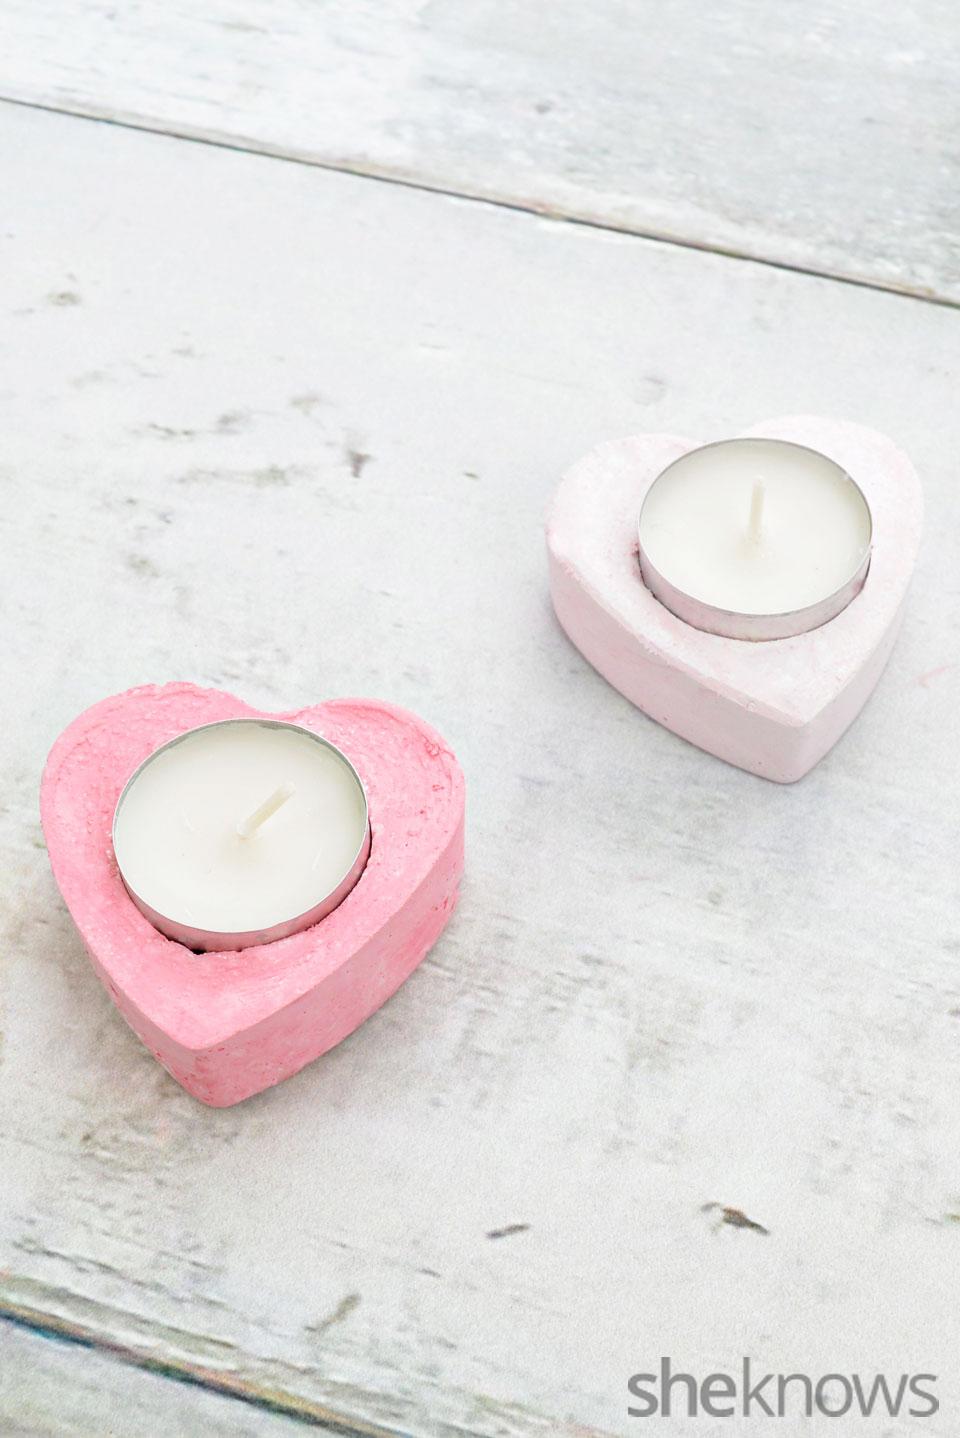 Heart-shaped votive holders